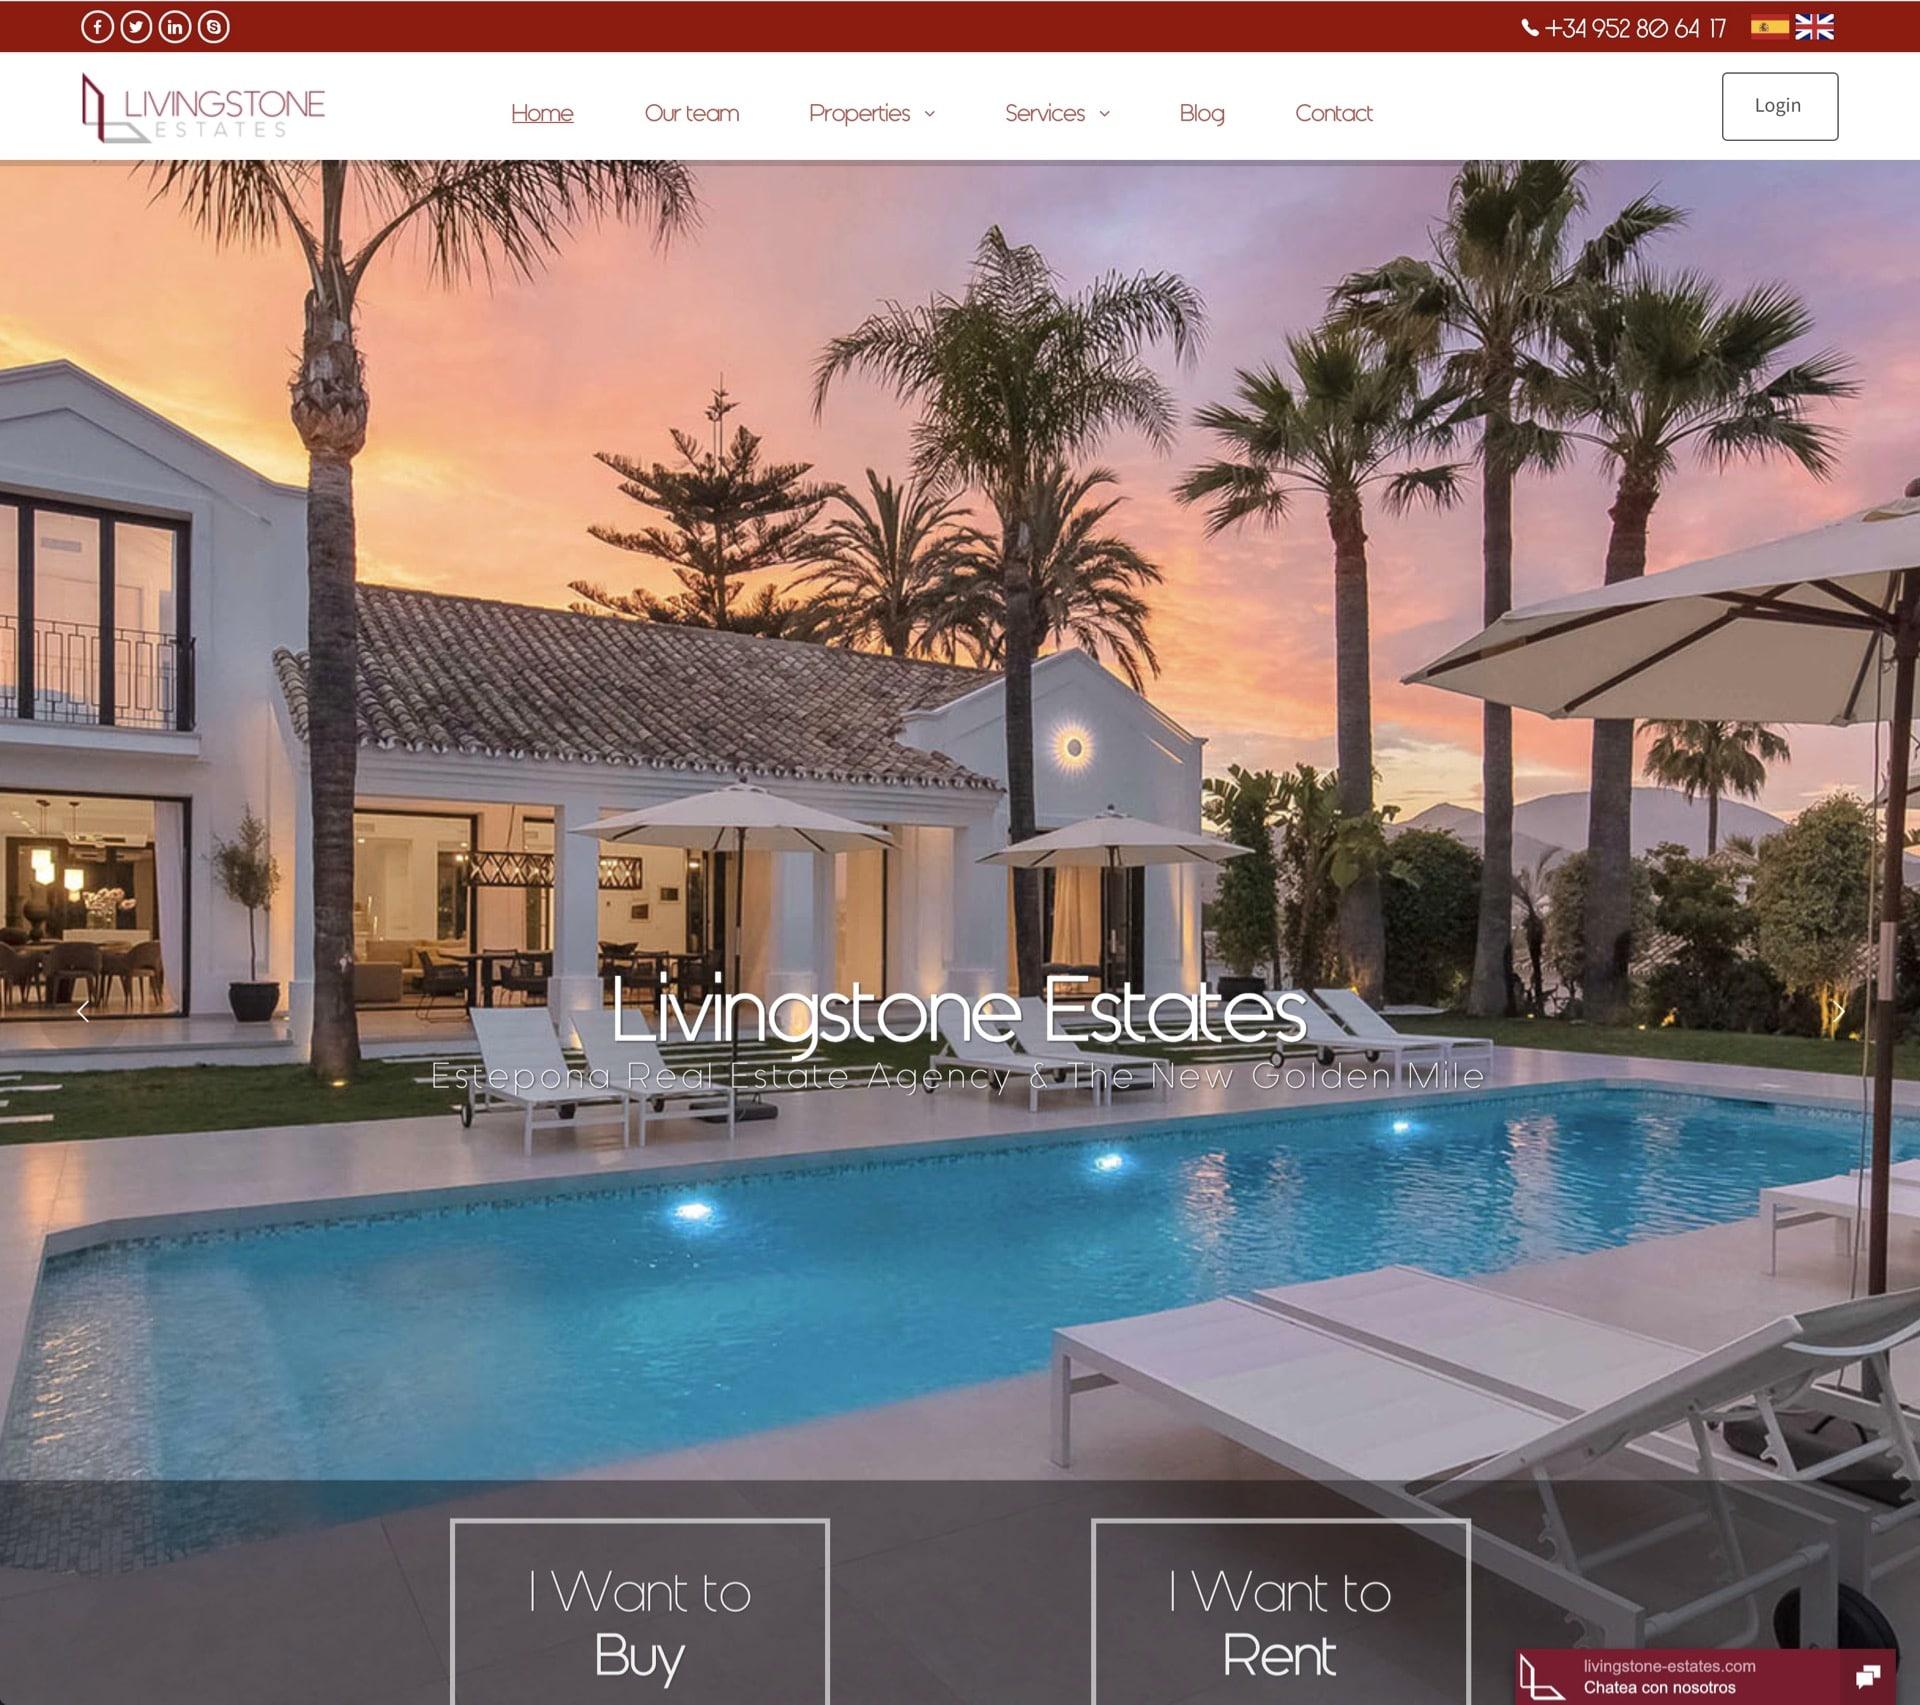 livingstone-estates-real- estate